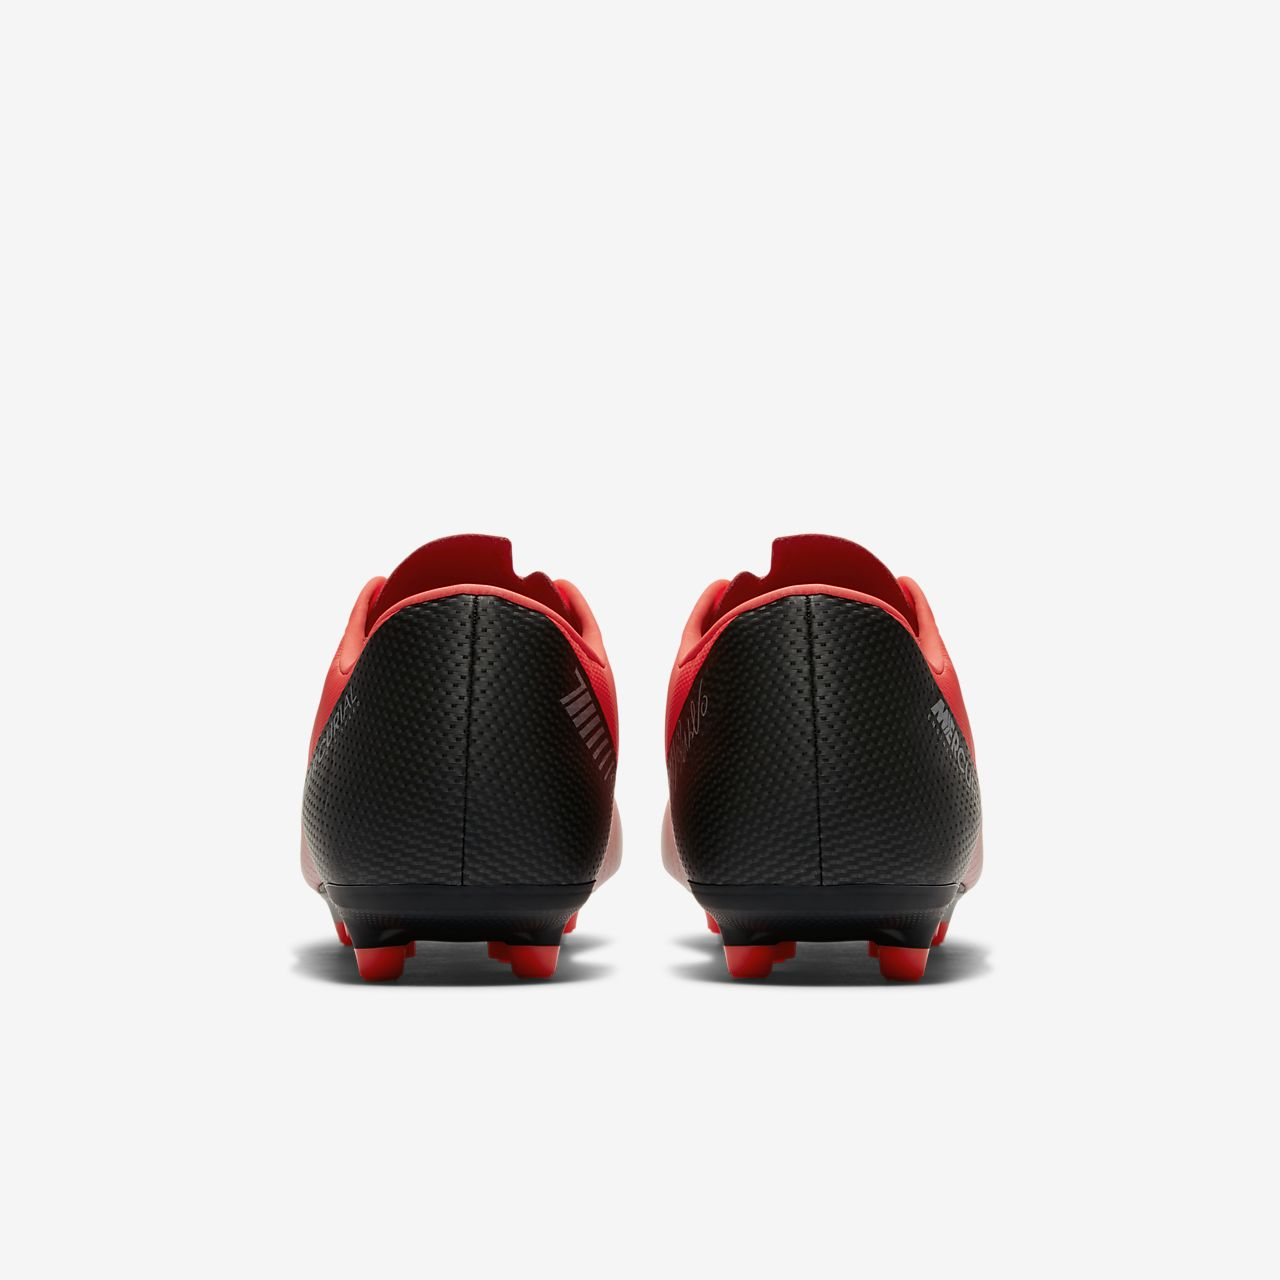 Zapatos Yoga Nike Zapatos Yoga Zapatos Nike 8rqwZU8